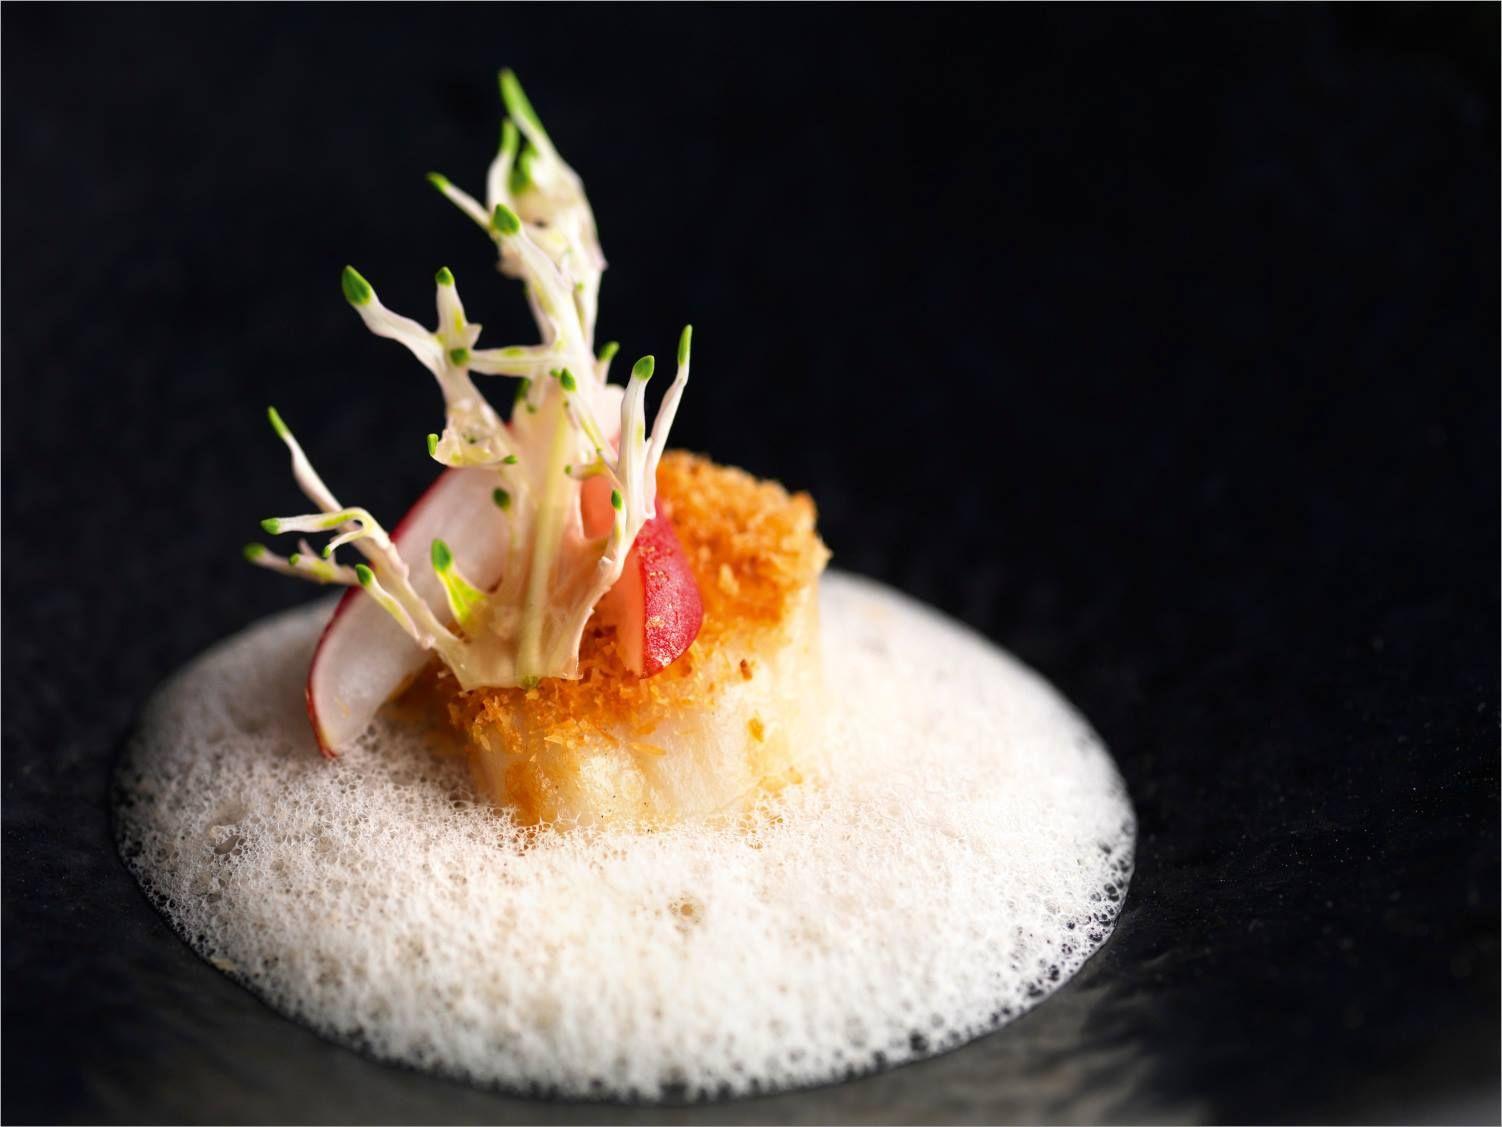 Noix De St Jacques Scallop Essen Und Trinken Fingerfood Rezepte